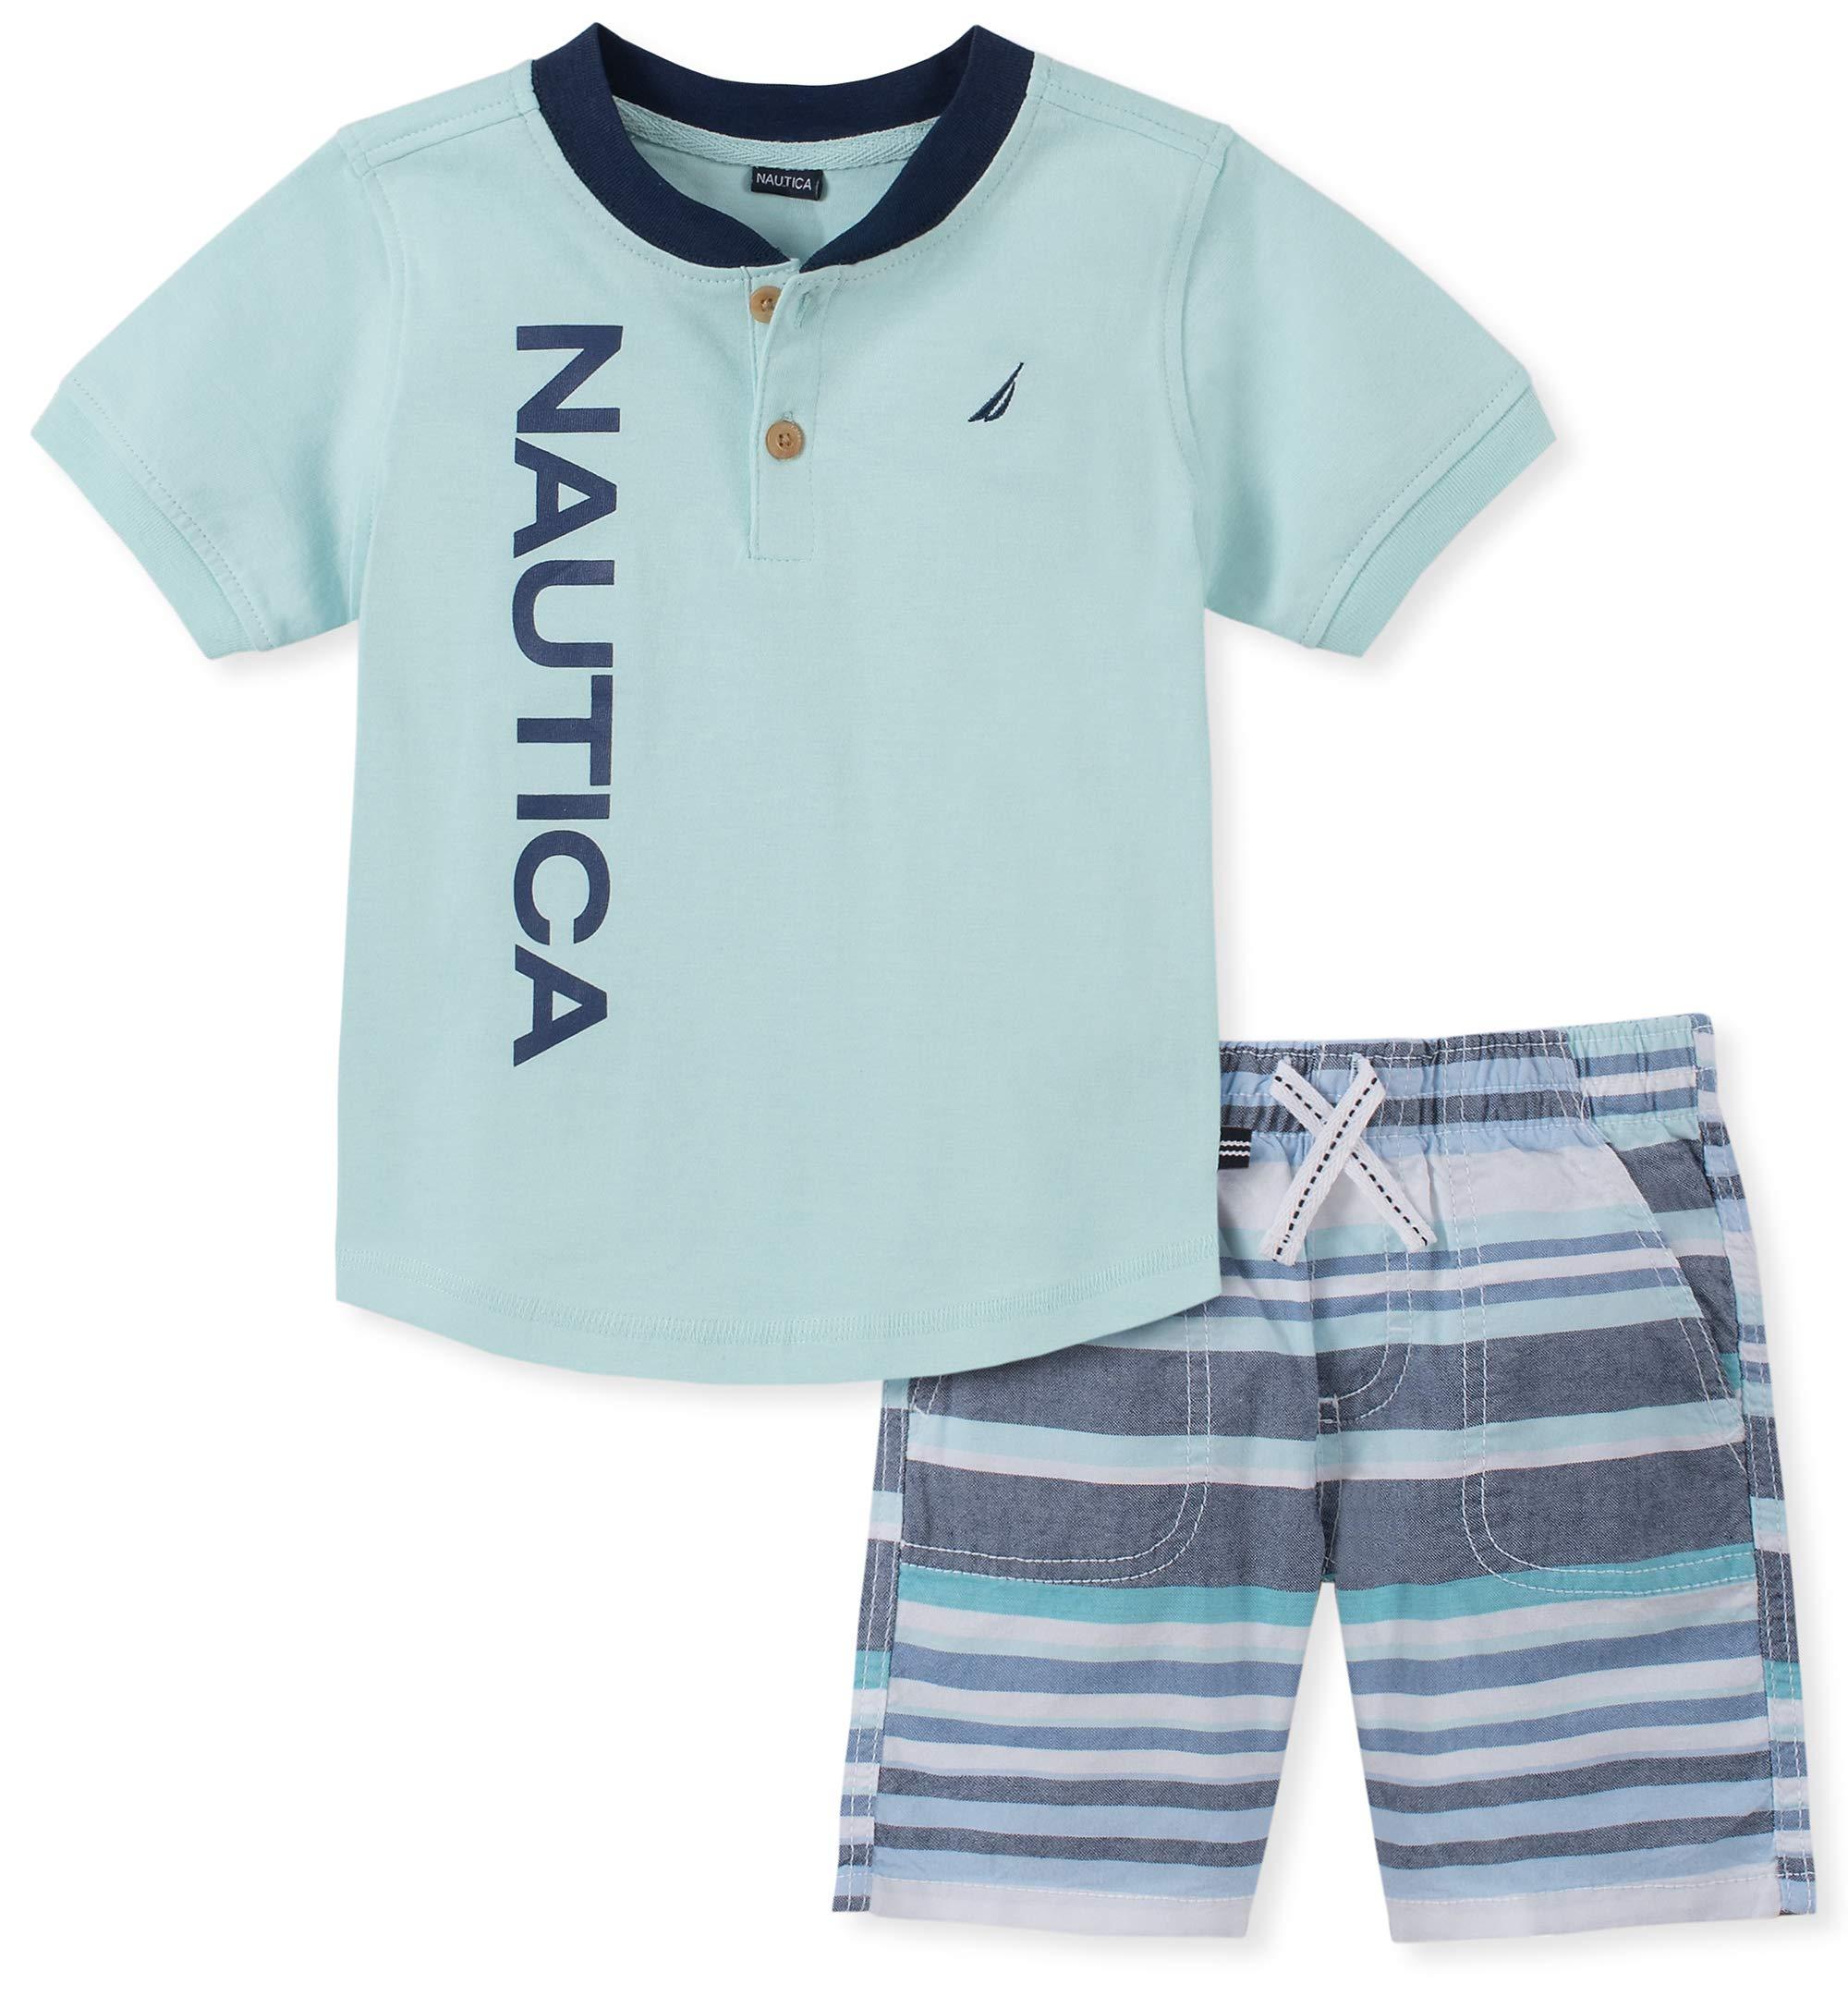 Nautica Sets (KHQ) Boys' Toddler 2 Pieces Shorts Set, Multi, 4T